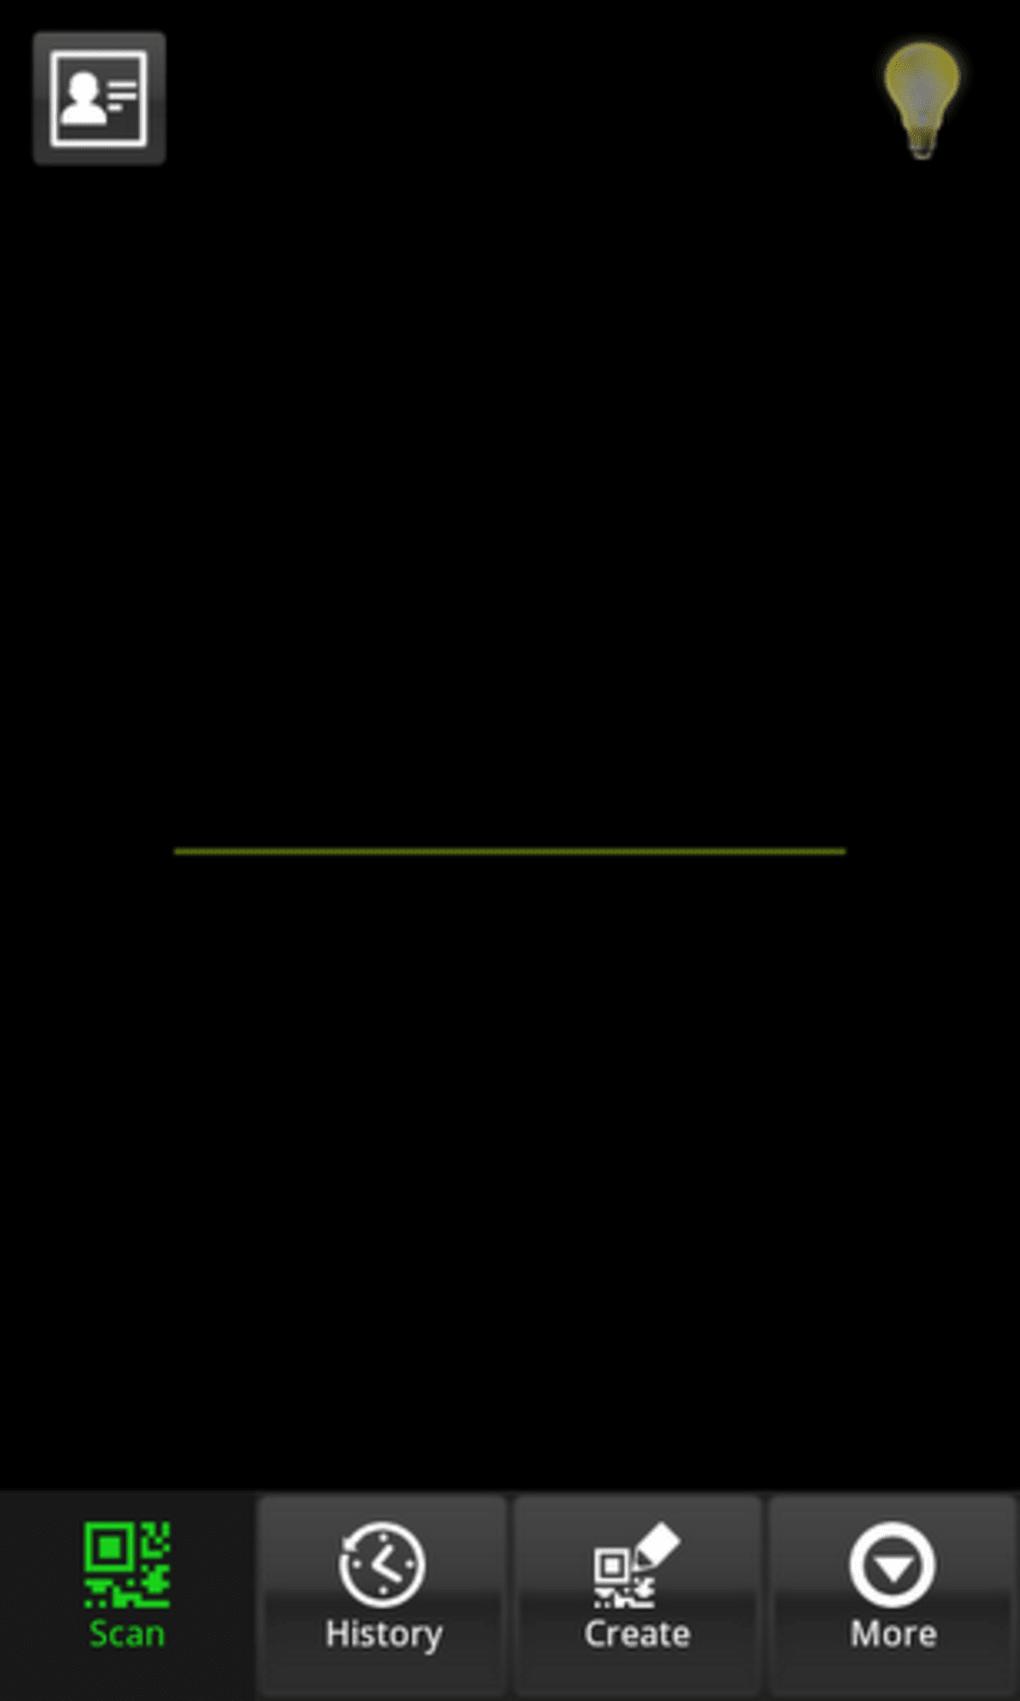 qr droid para iphone gratis